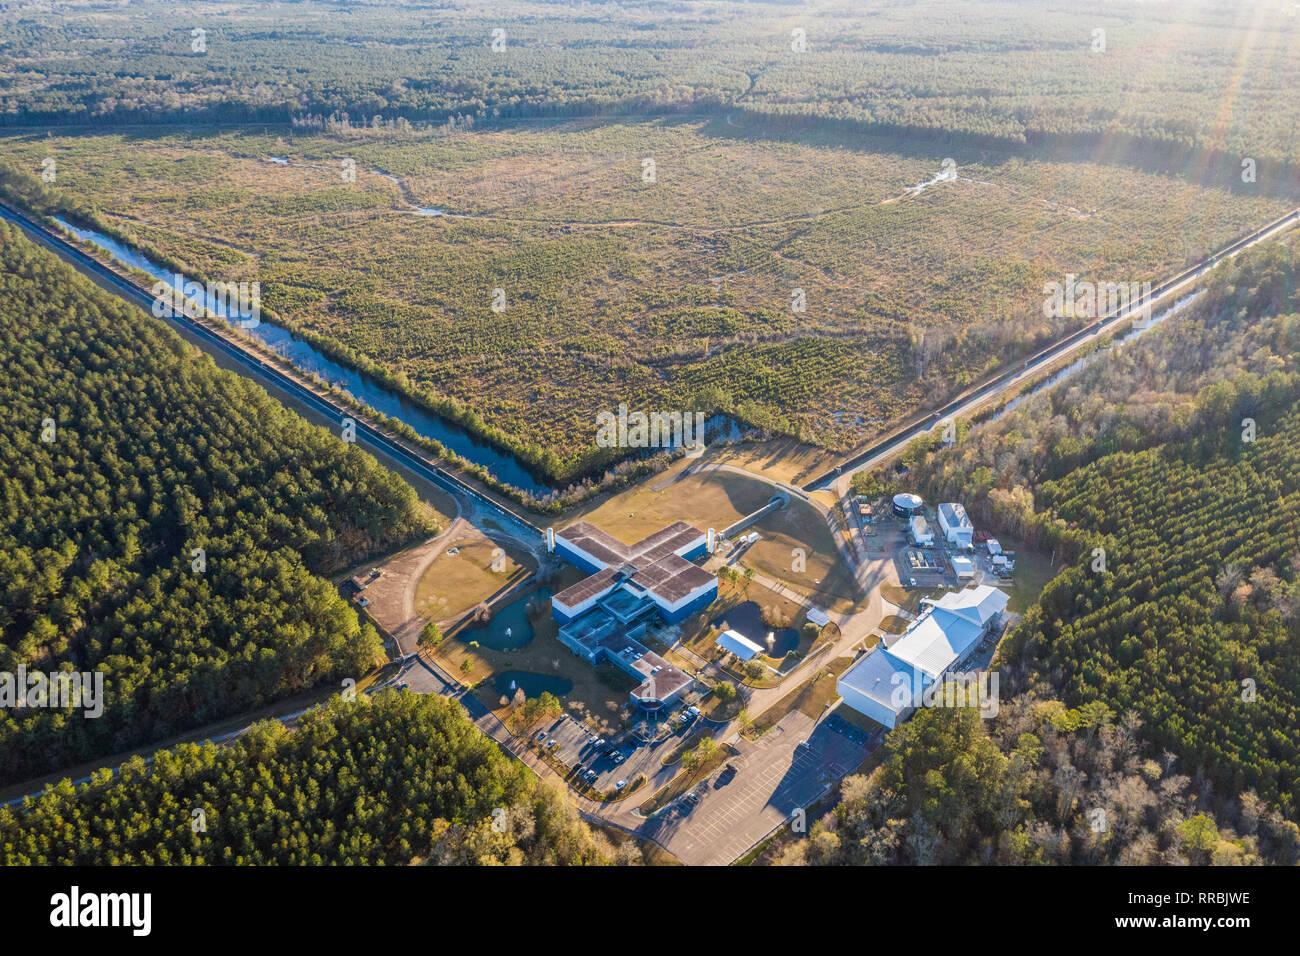 Aerial shot of the advanced LIGO gravitational detector in Livingston, Louisiana - Stock Image